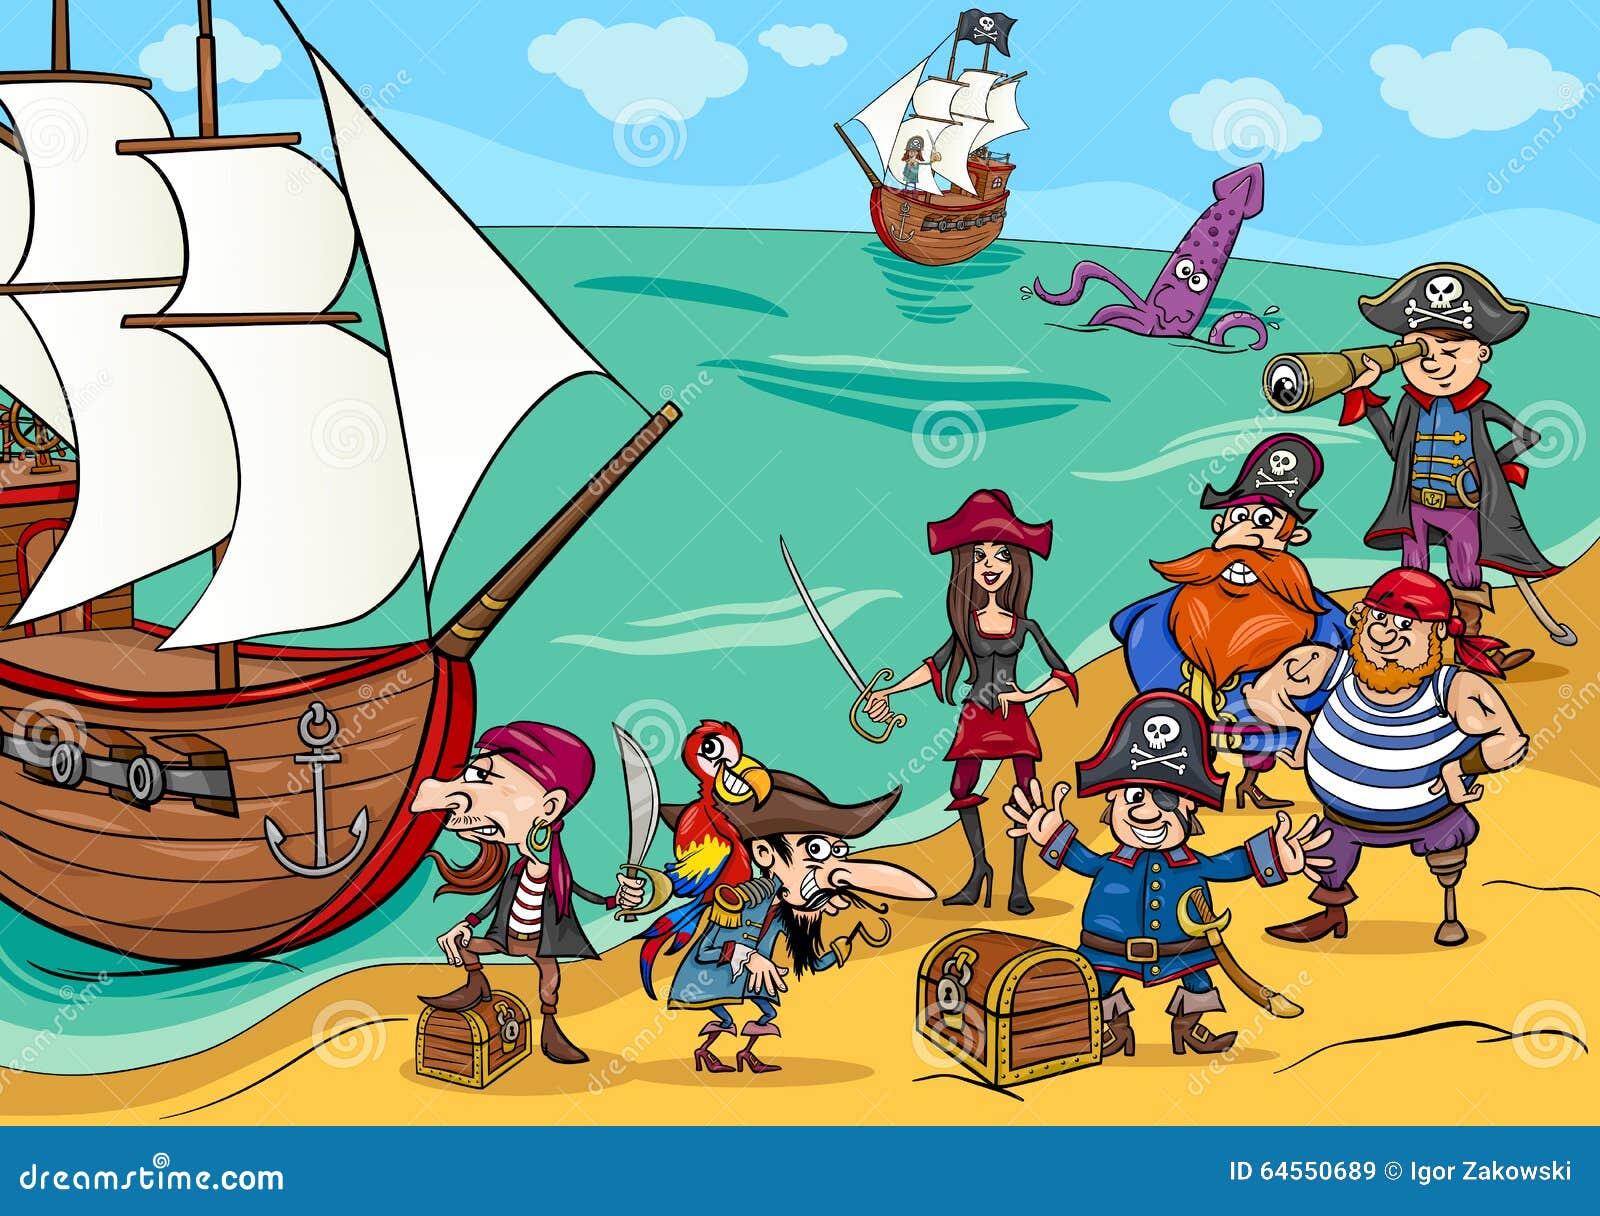 Pirates With Ship Cartoon Stock Vector - Image: 64550689